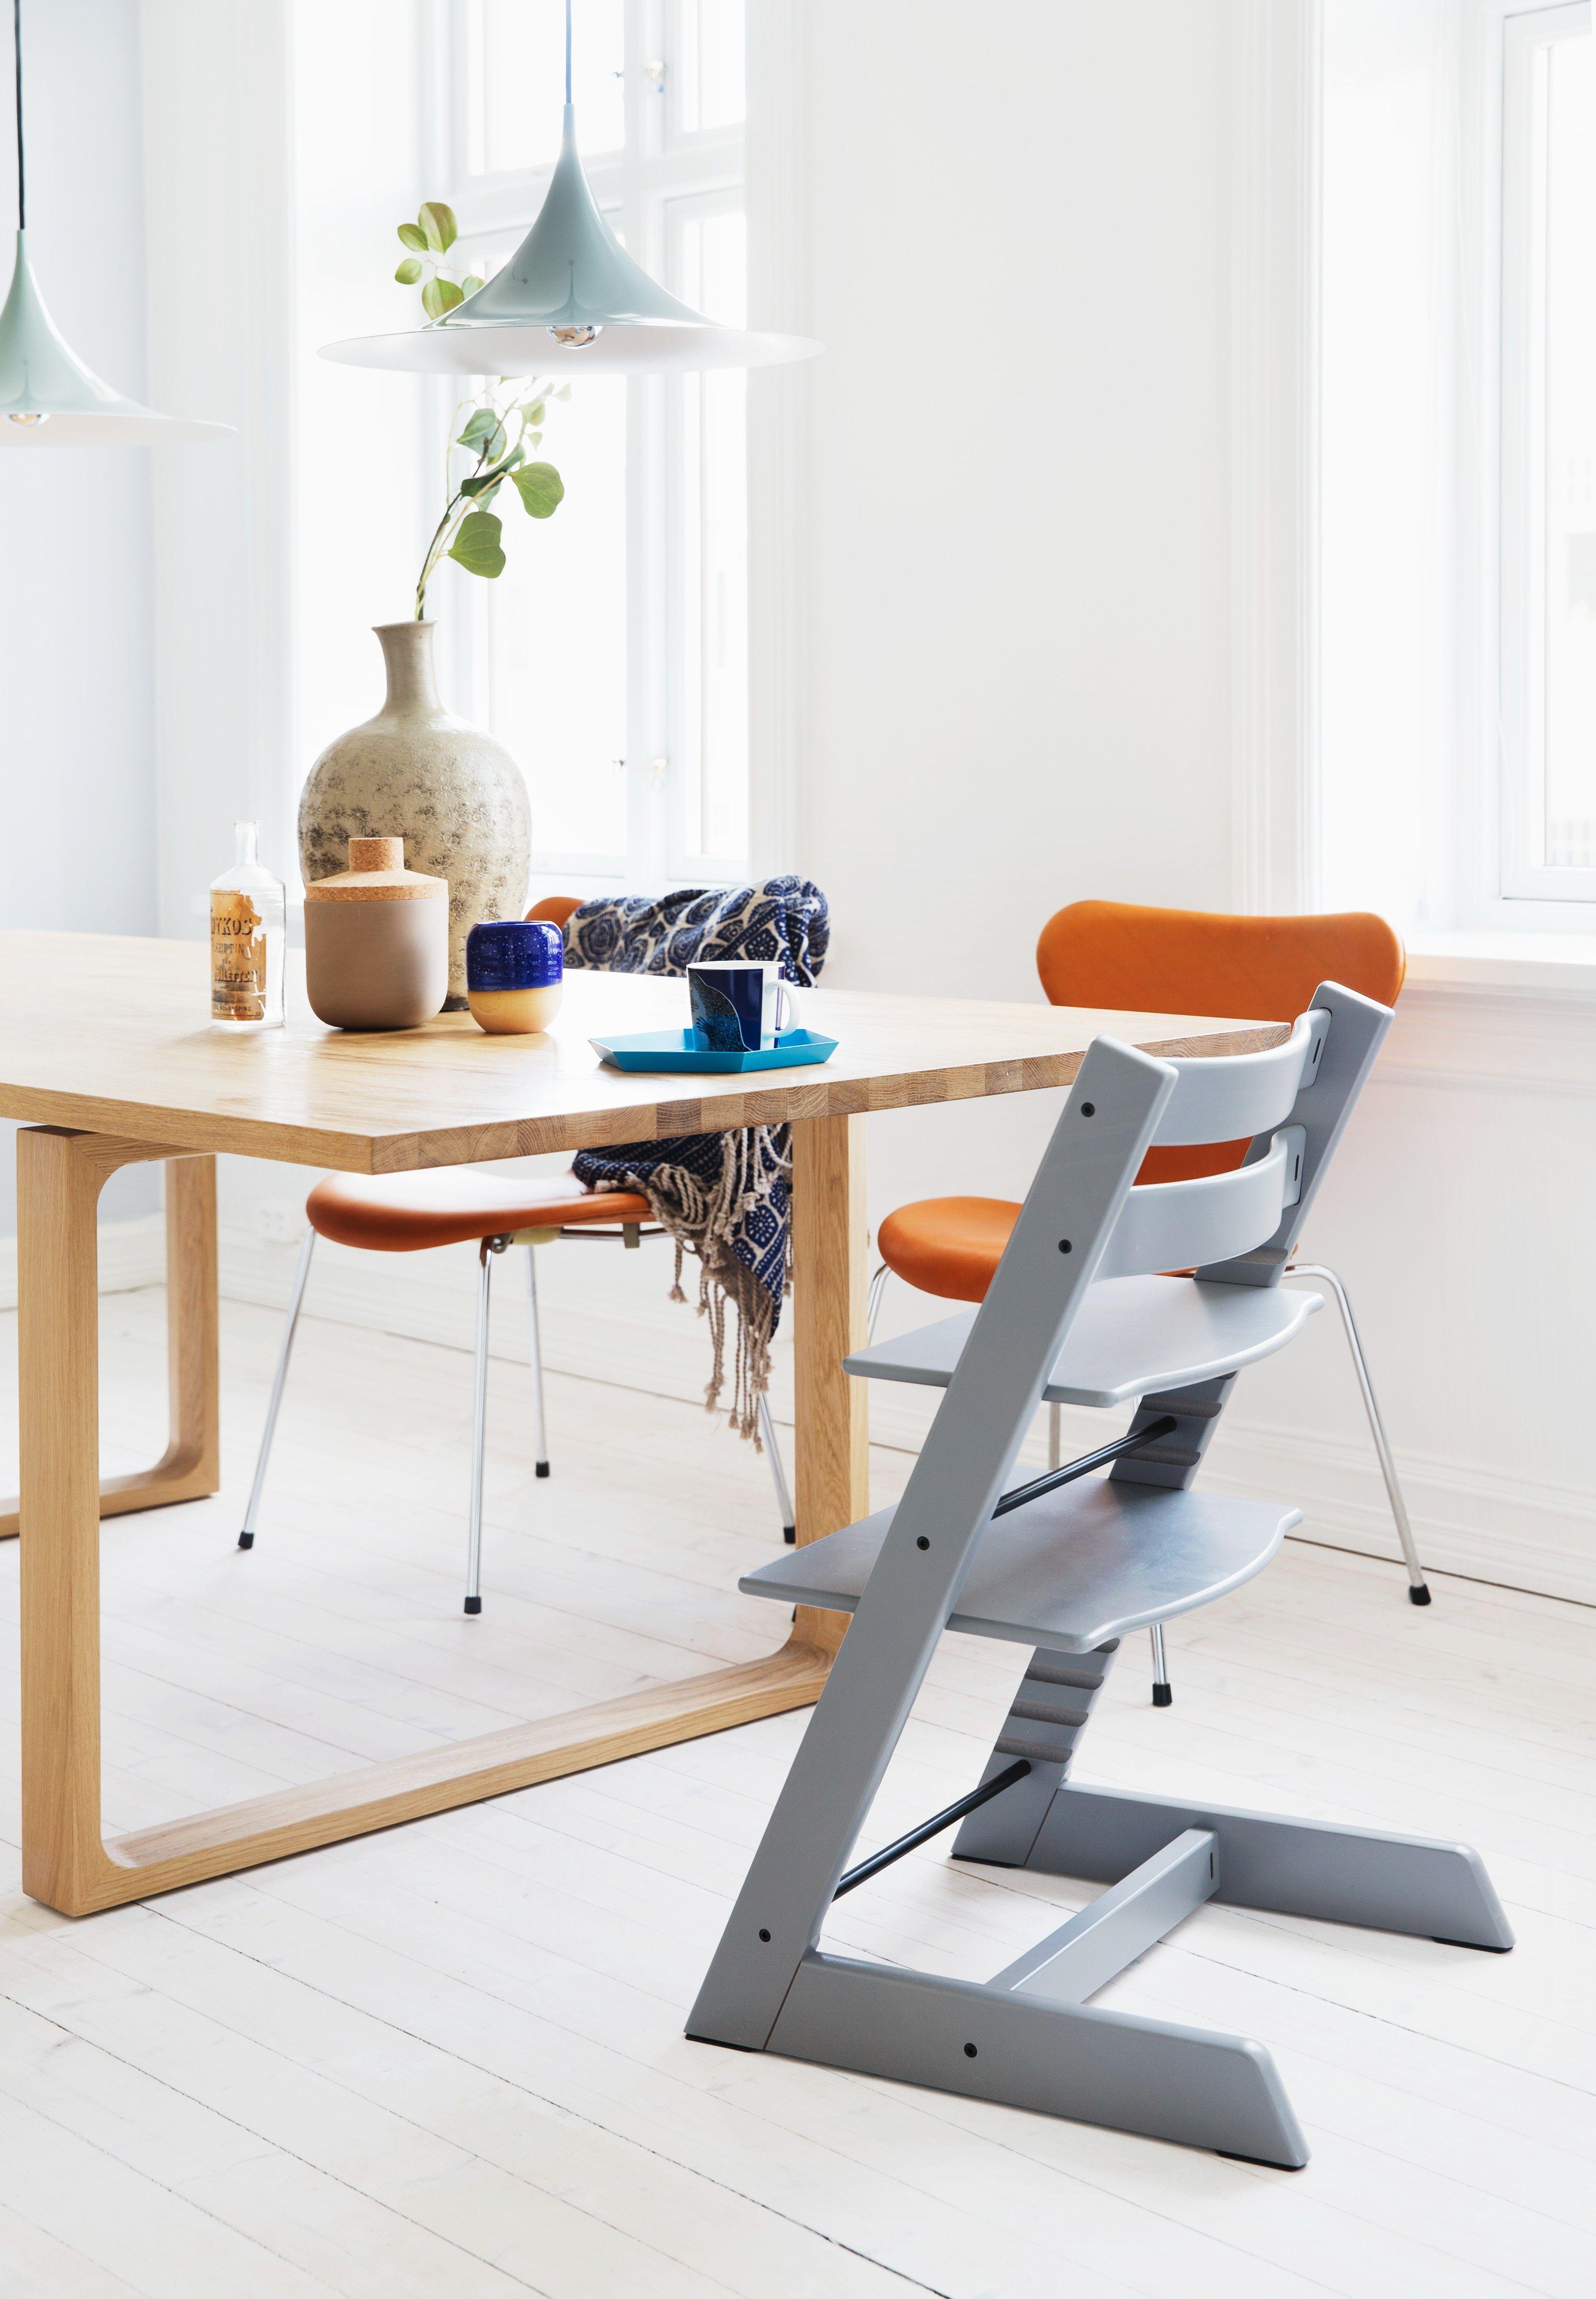 tripp trapp high chair hammock stand indoor stokke in storm grey nursery kids room